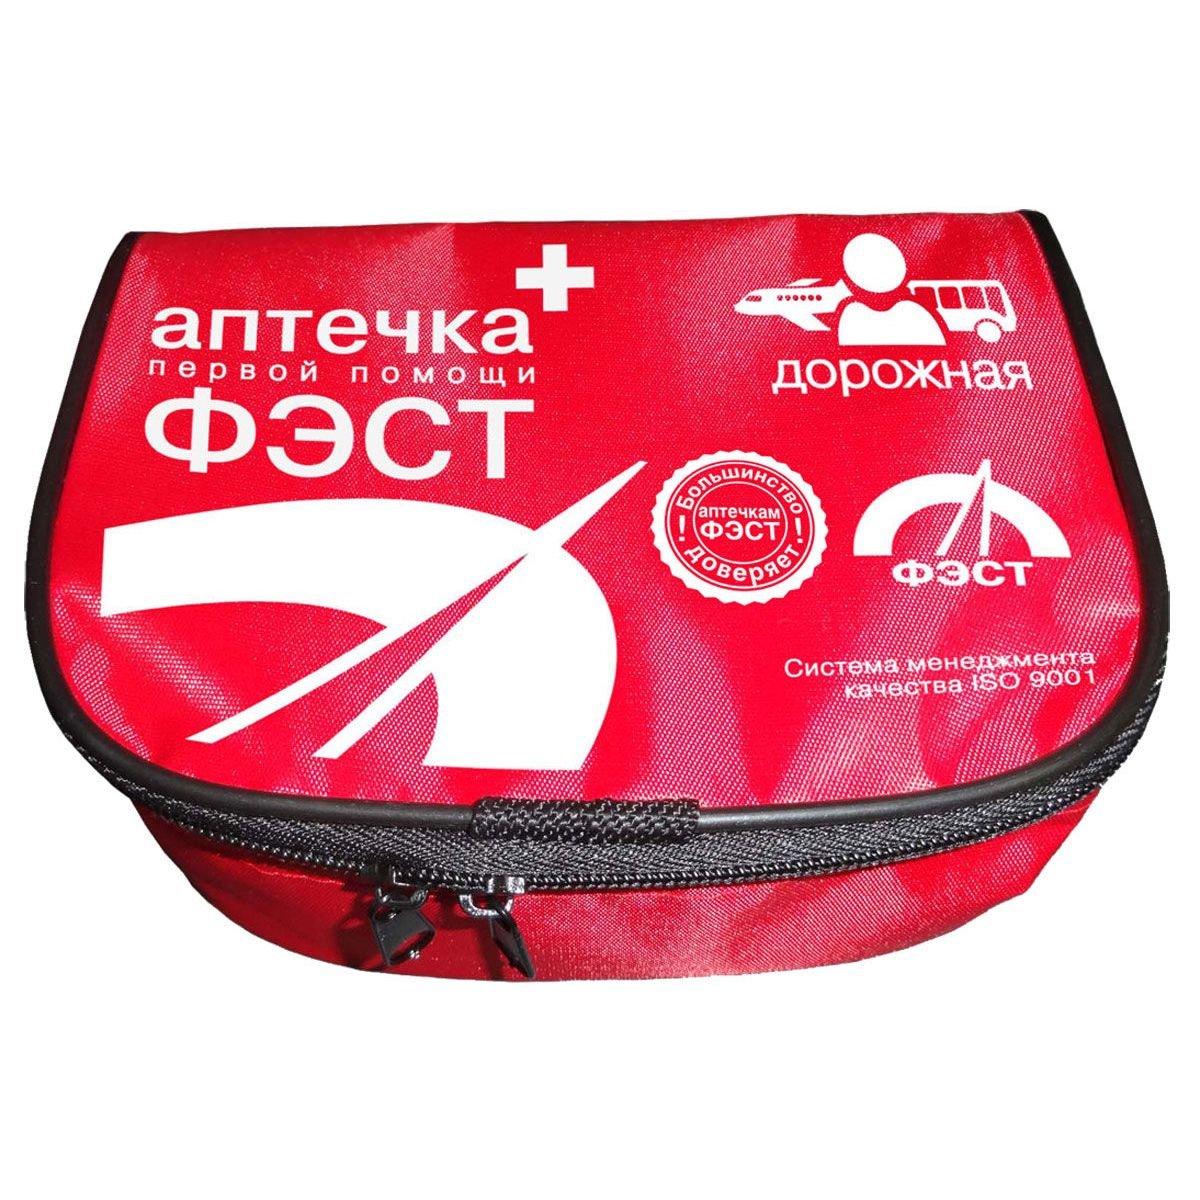 Аптечка «Дорожная - 1» ФЭСТ в мягком футляре YFEST001M